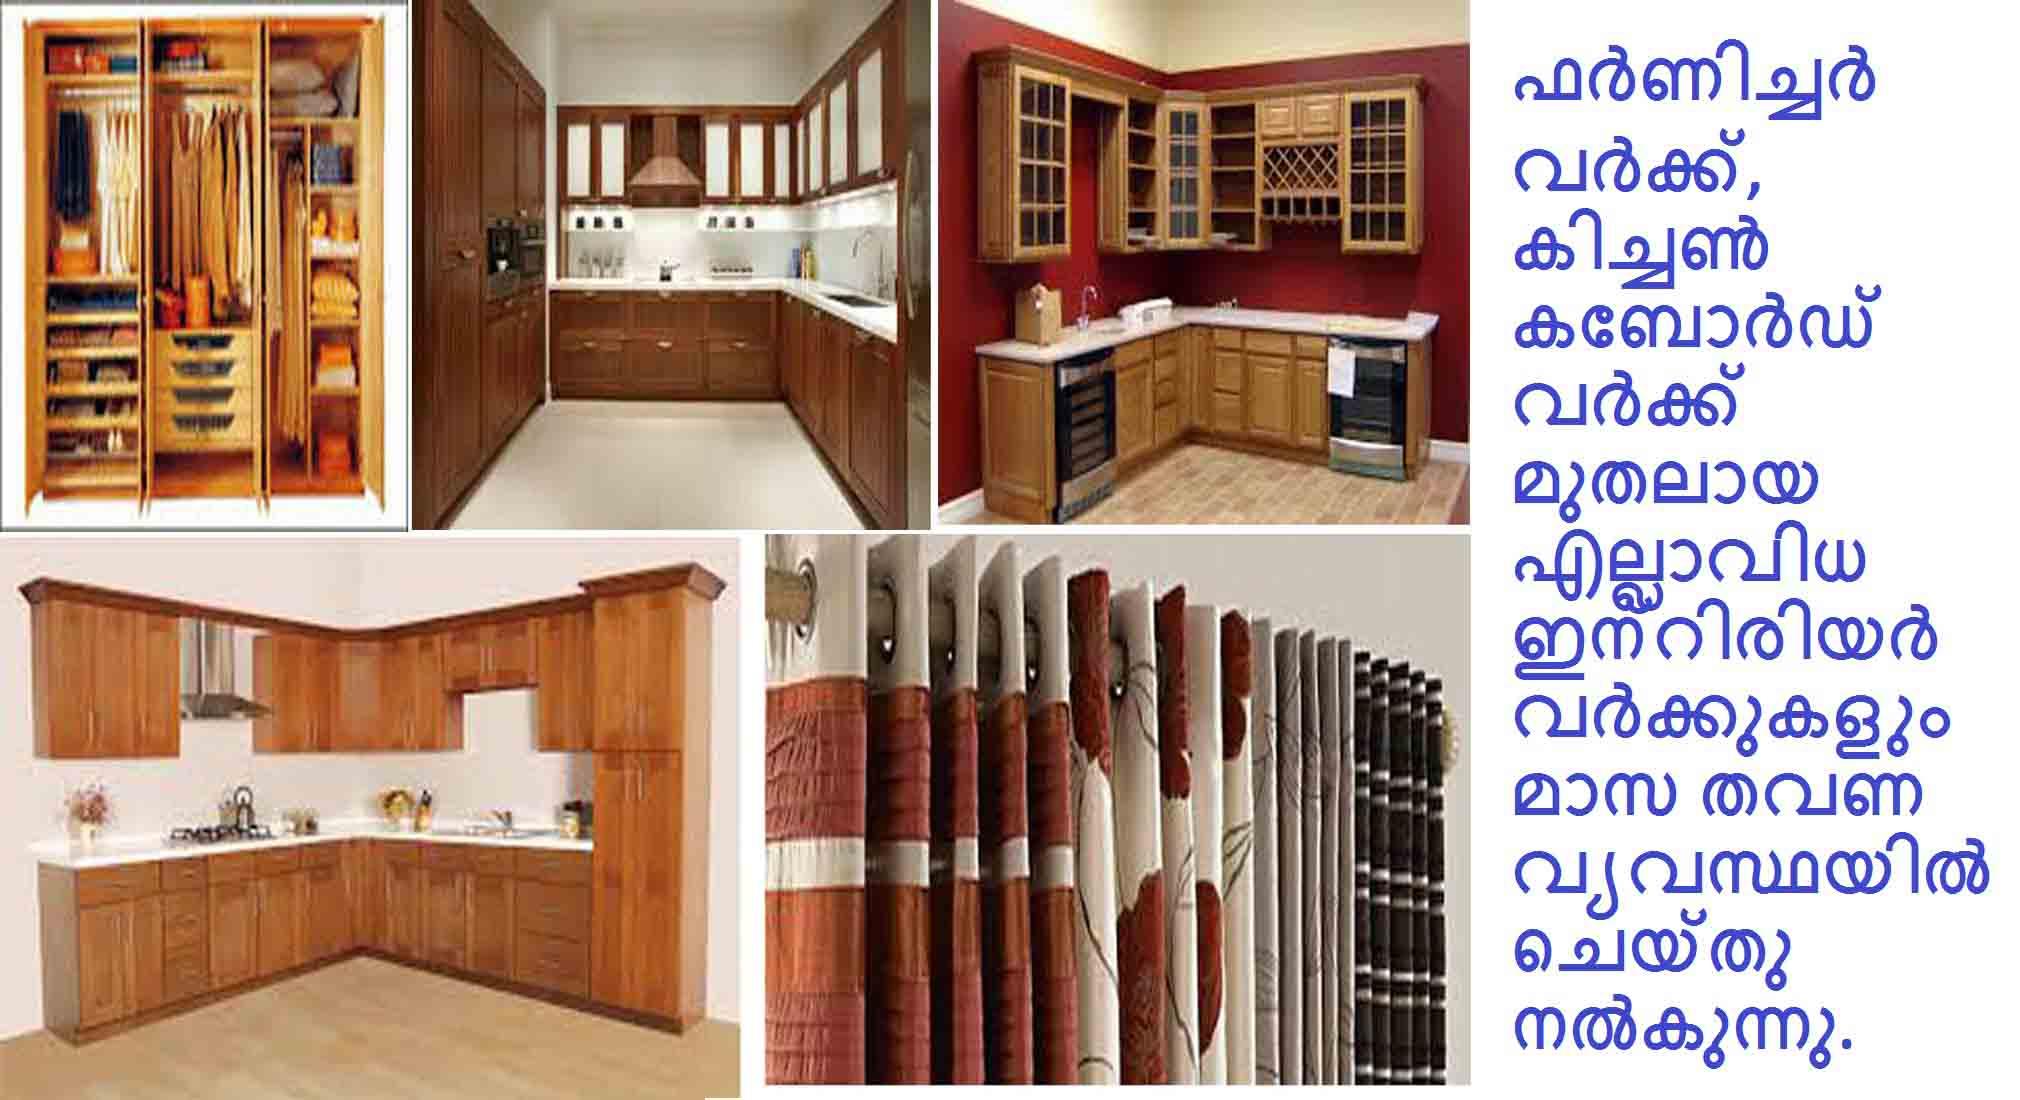 100 Home Interior Design Kottayam Roof Fresh Clay